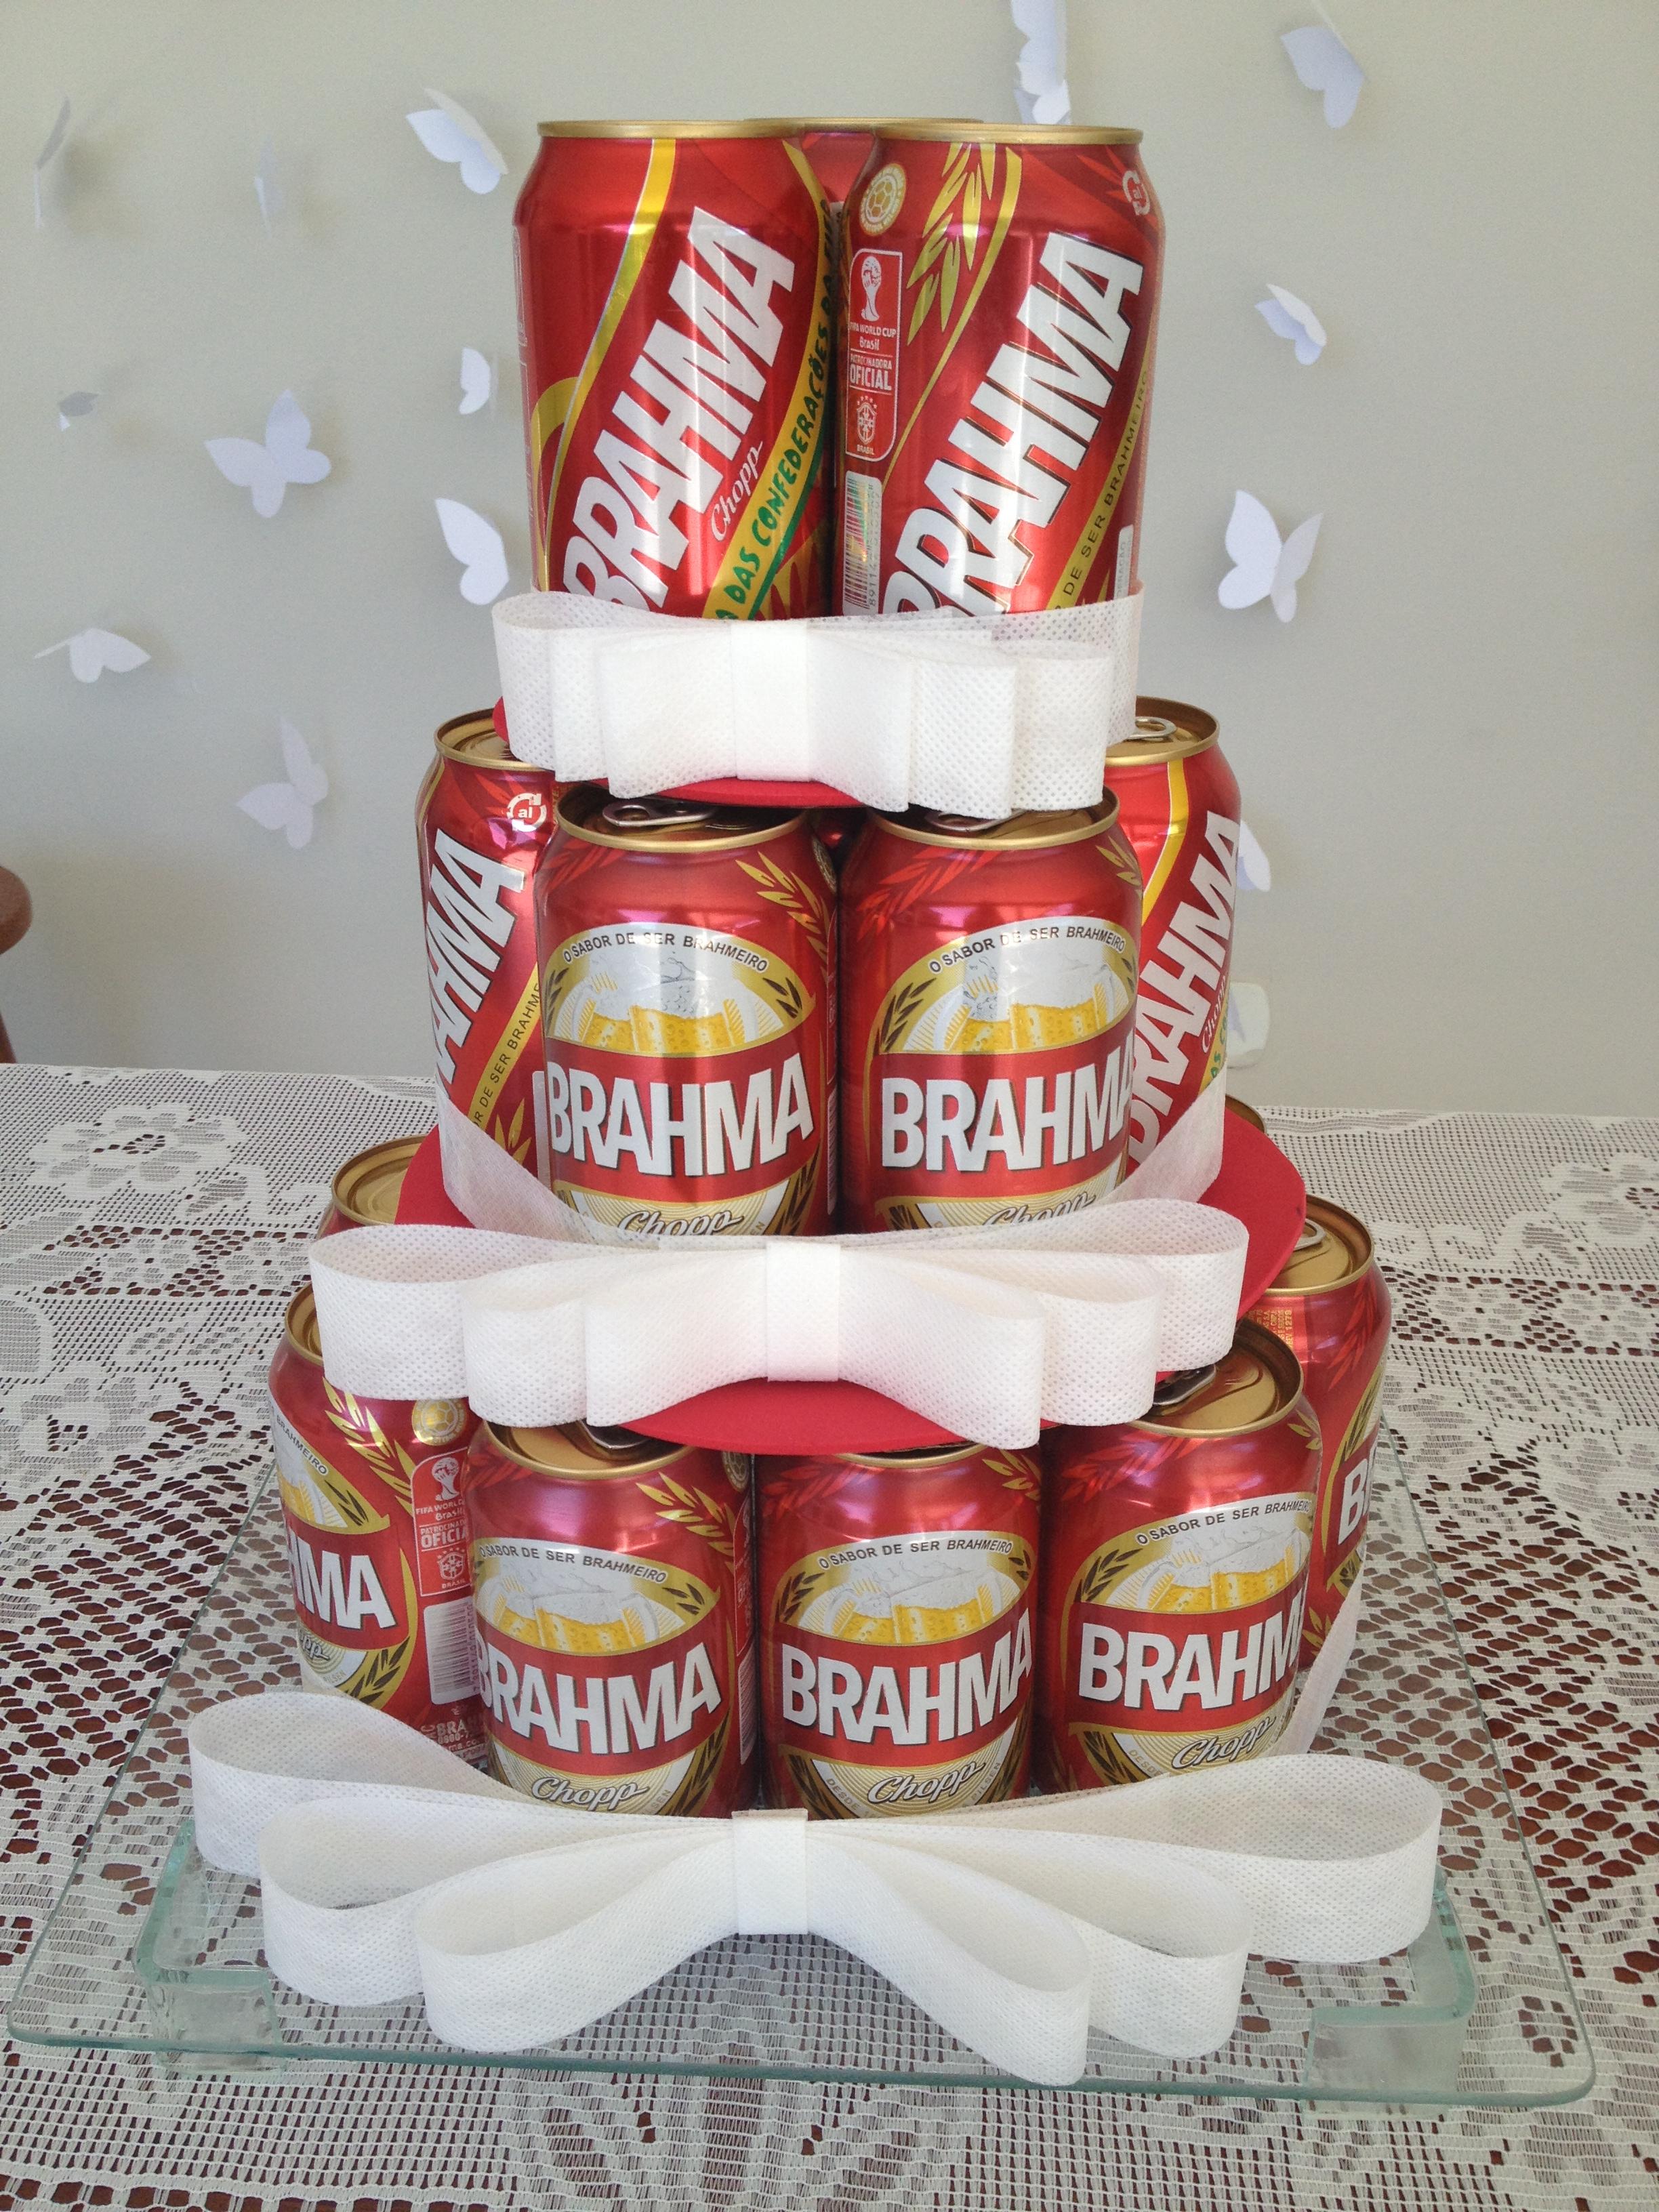 decoracao boteco noivado : decoracao boteco noivado: um charme na mesa do bolo, claro se o tema for boteco né? hahahahhaa